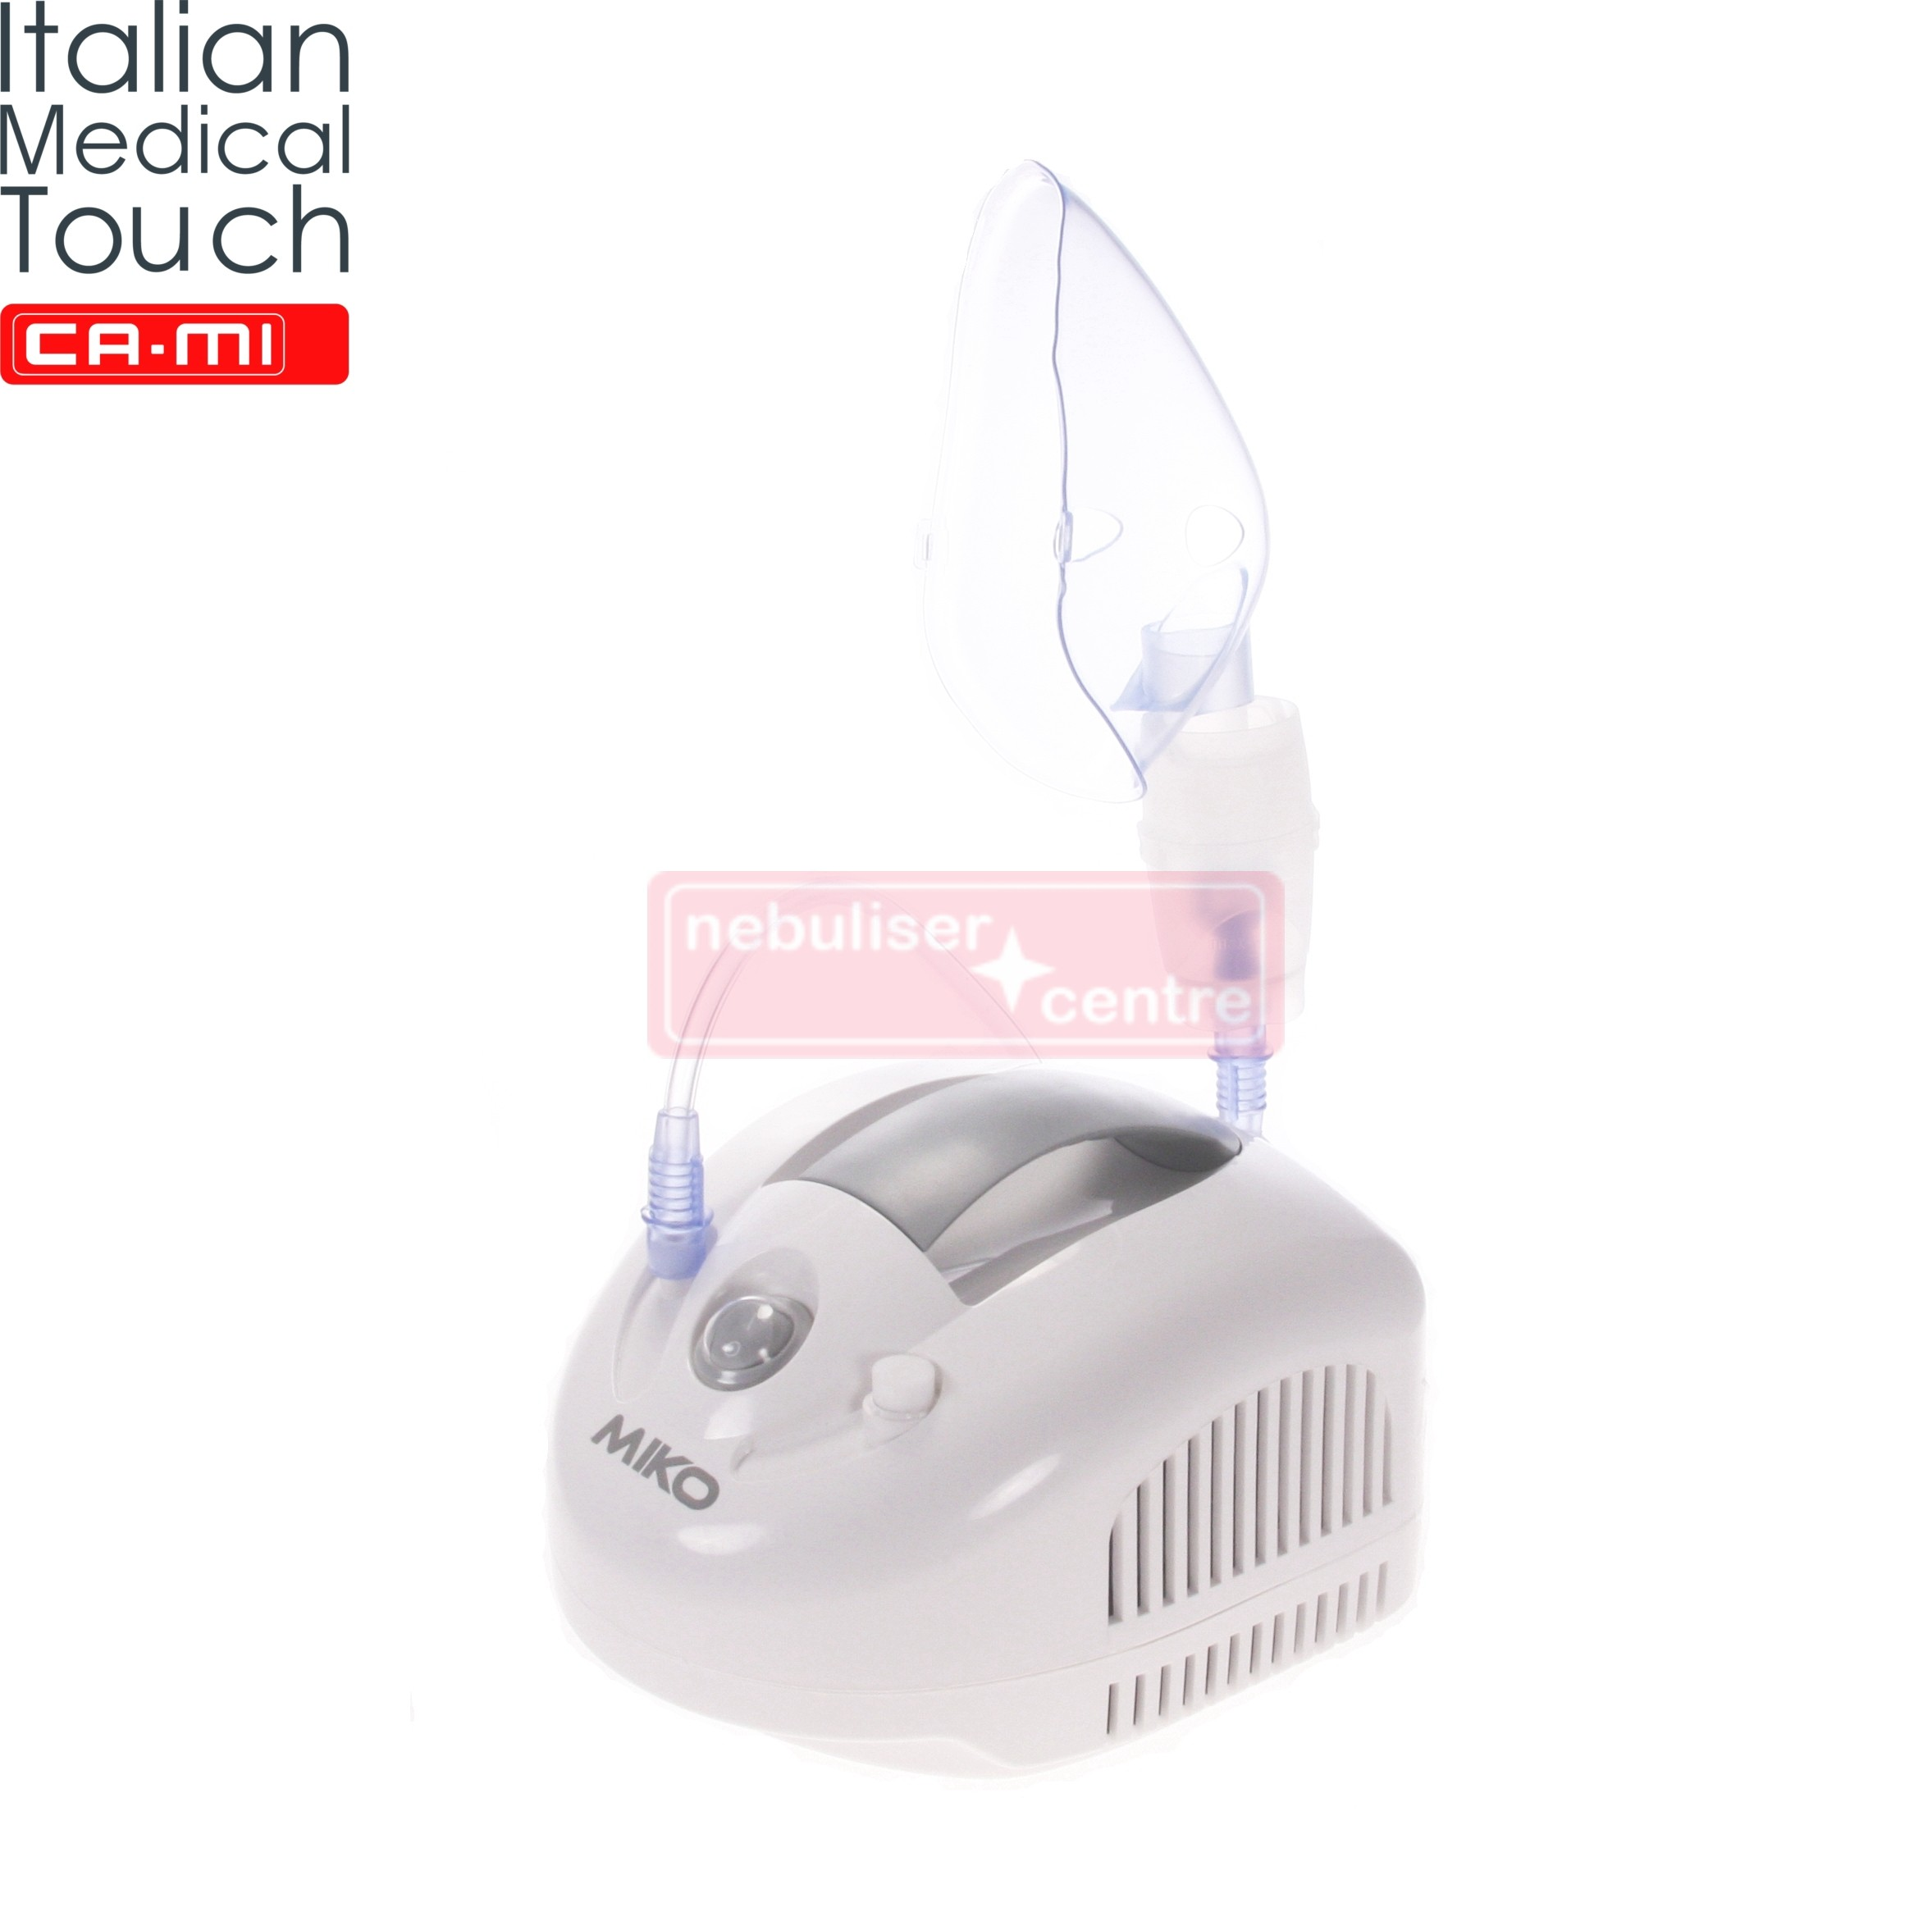 Nebuliser CA-MI Miko Basic- Compact nebuliser, basic nebuliser